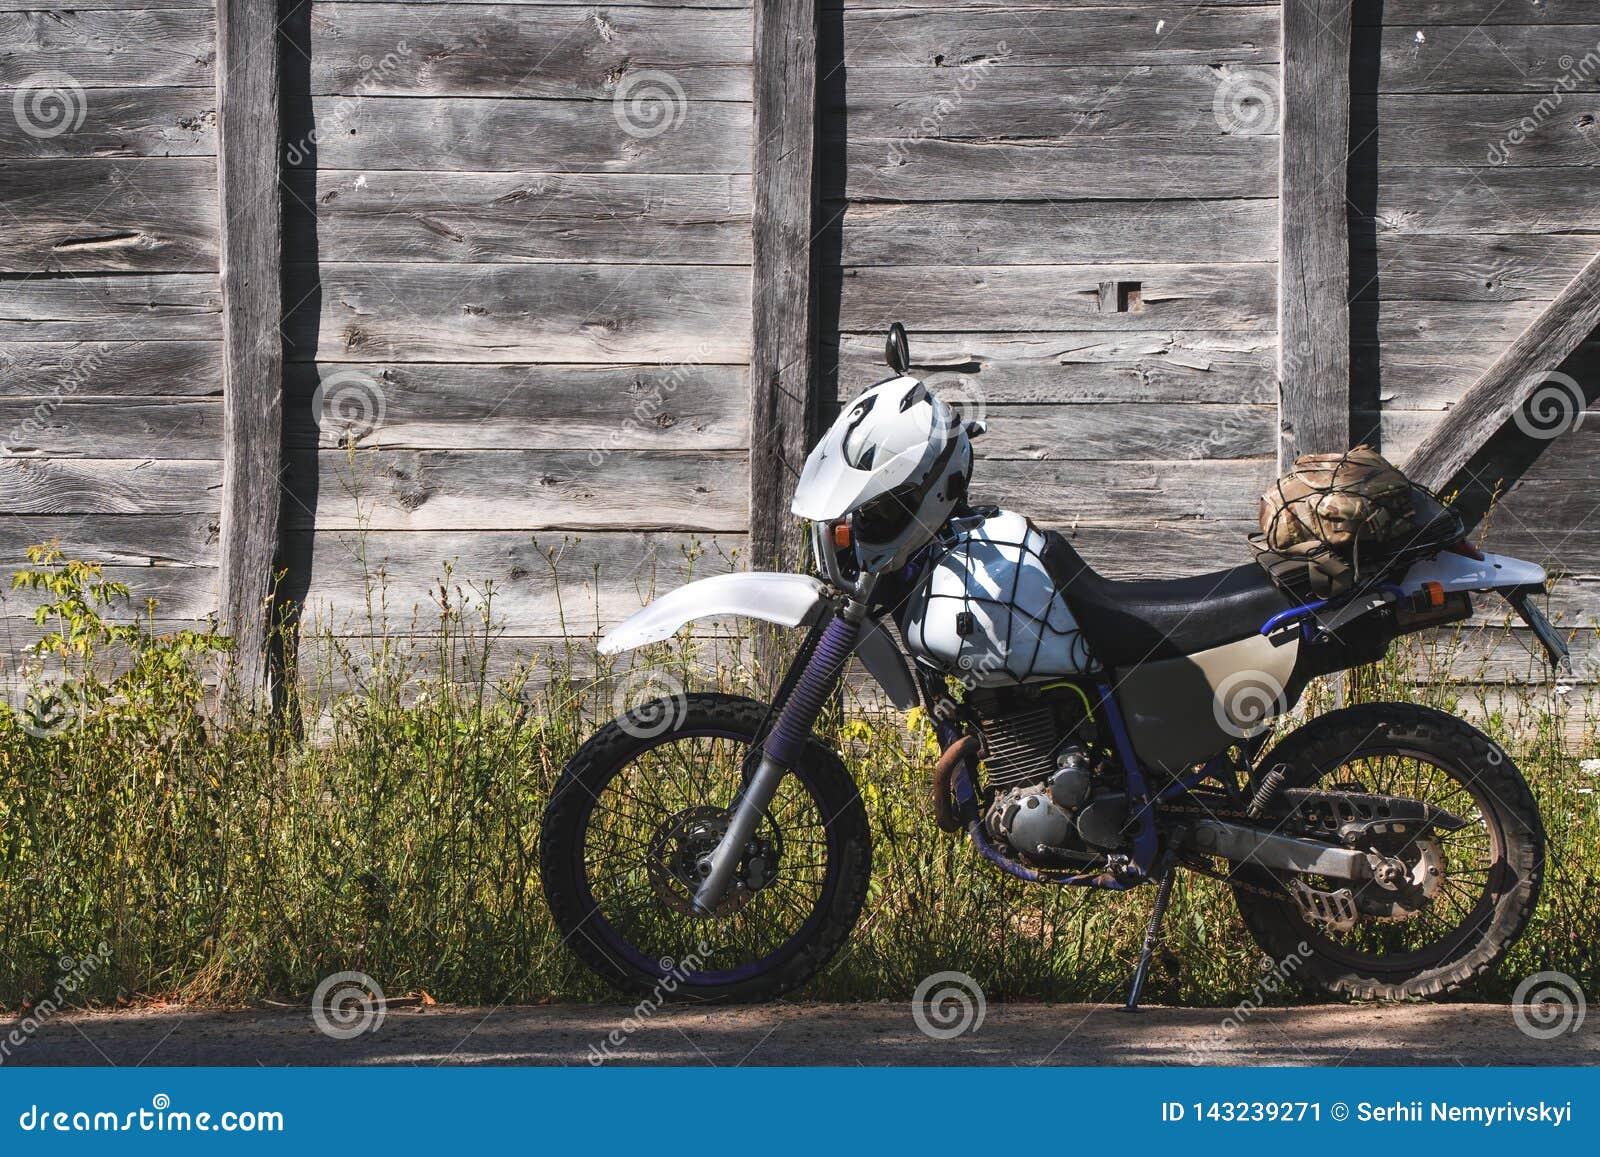 Bike vintage background wooden off road retro enduro